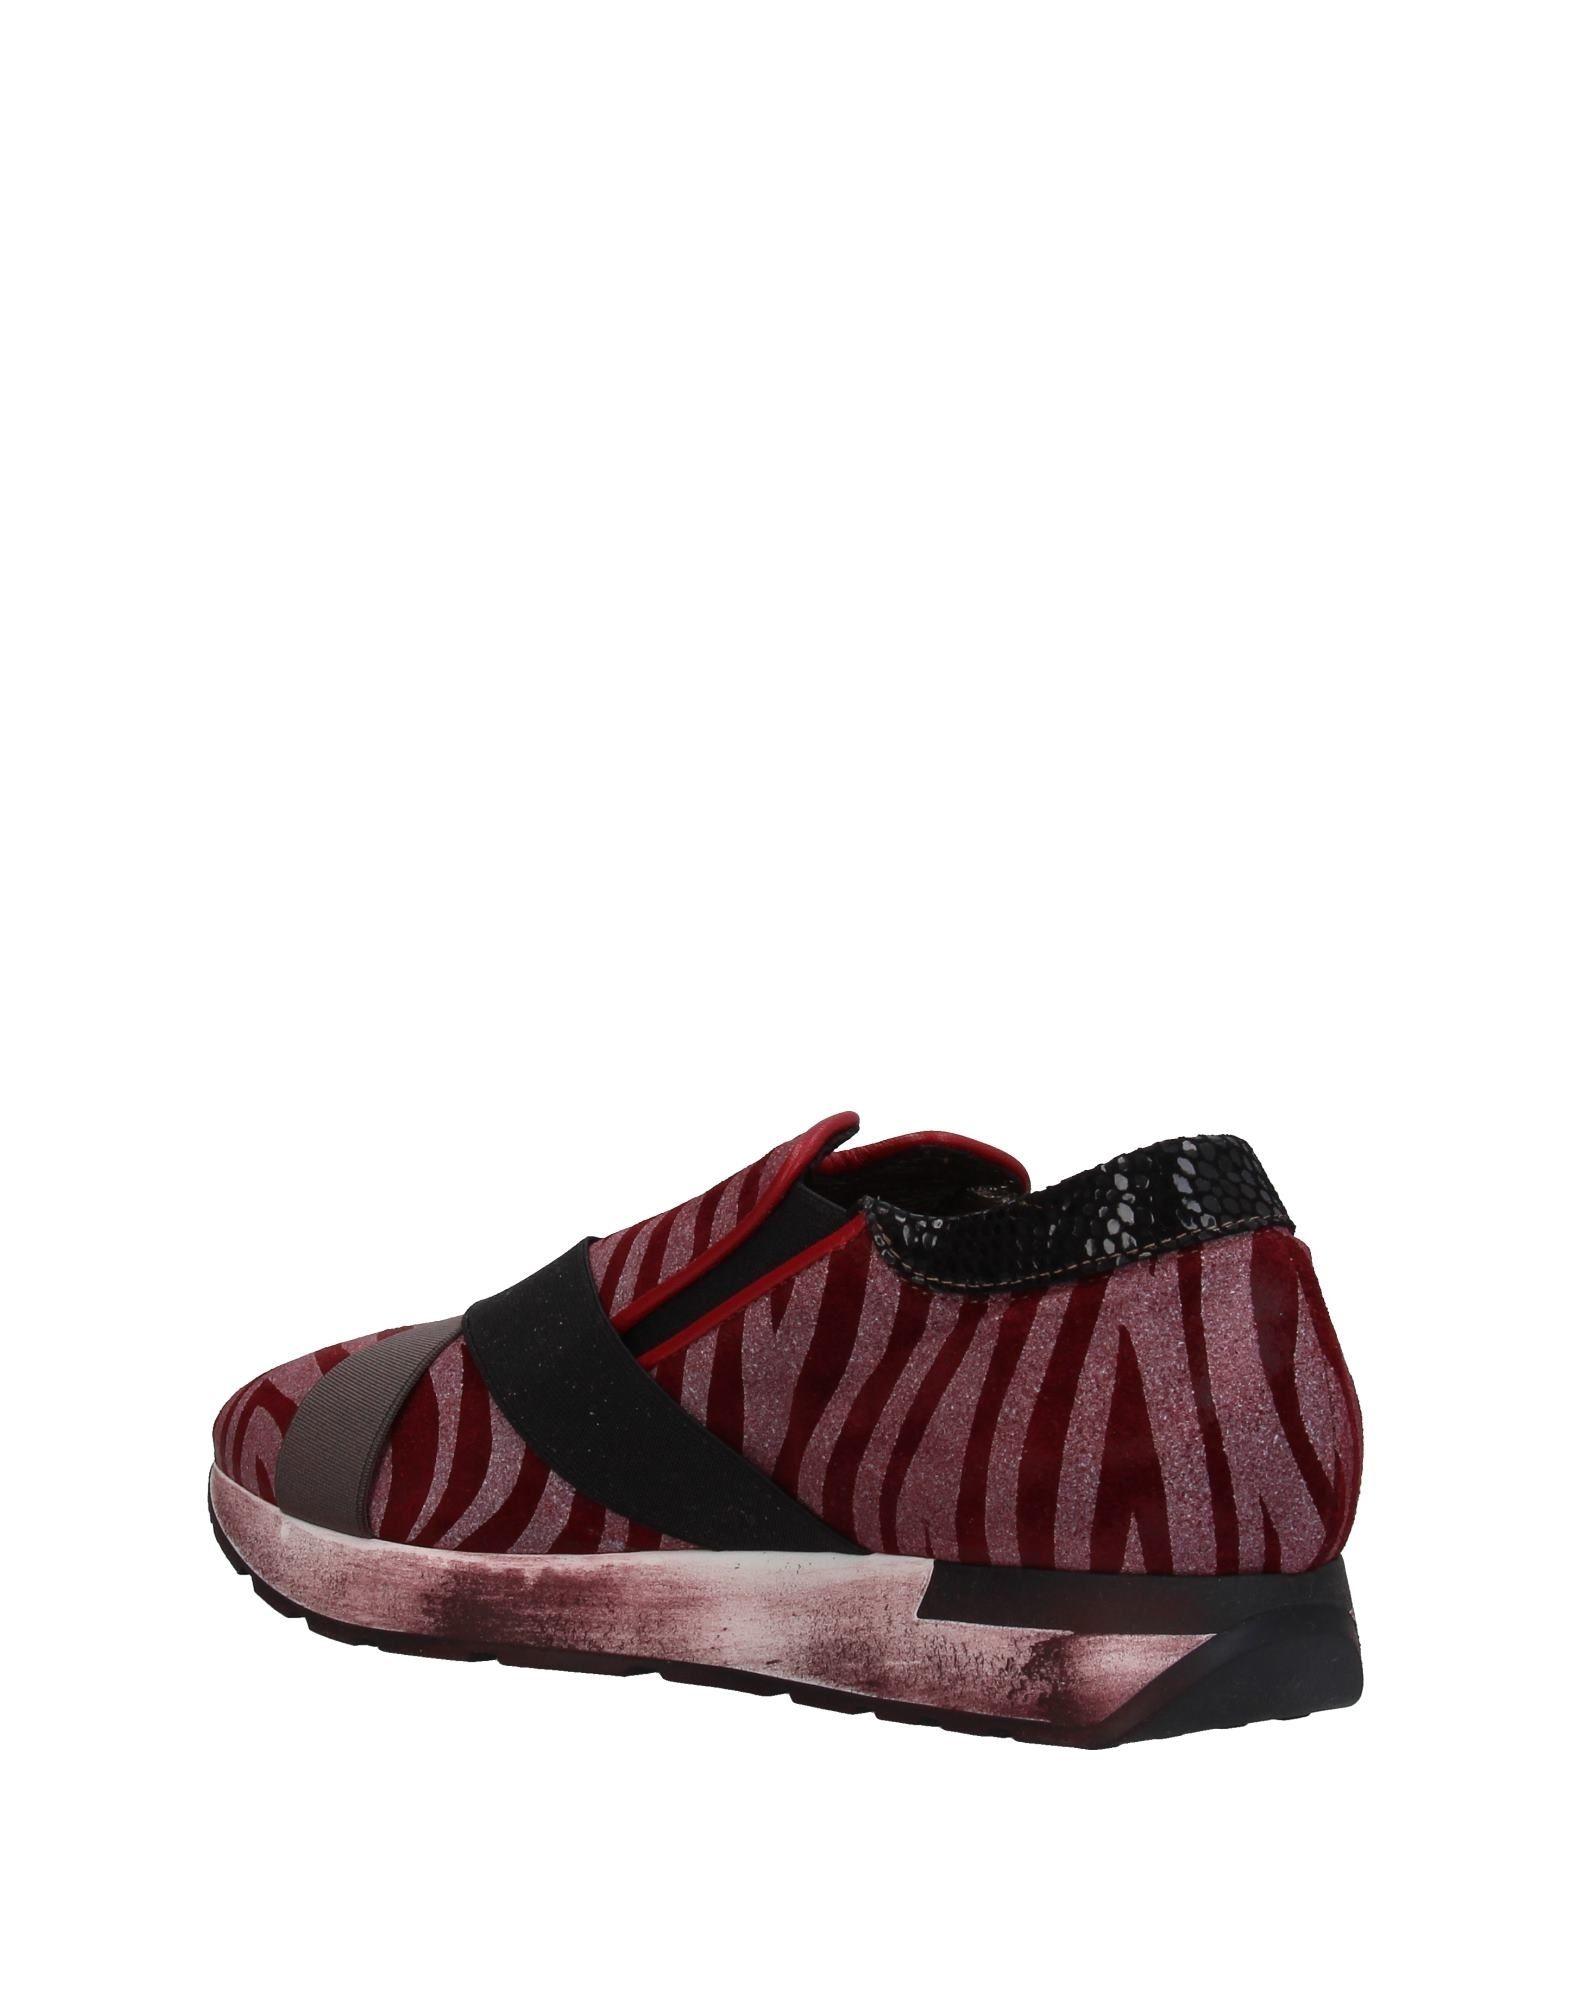 Haltbare Mode billige Schuhe Ebarrito Ebarrito Schuhe Sneakers Damen  11396779DT Heiße Schuhe 10656b